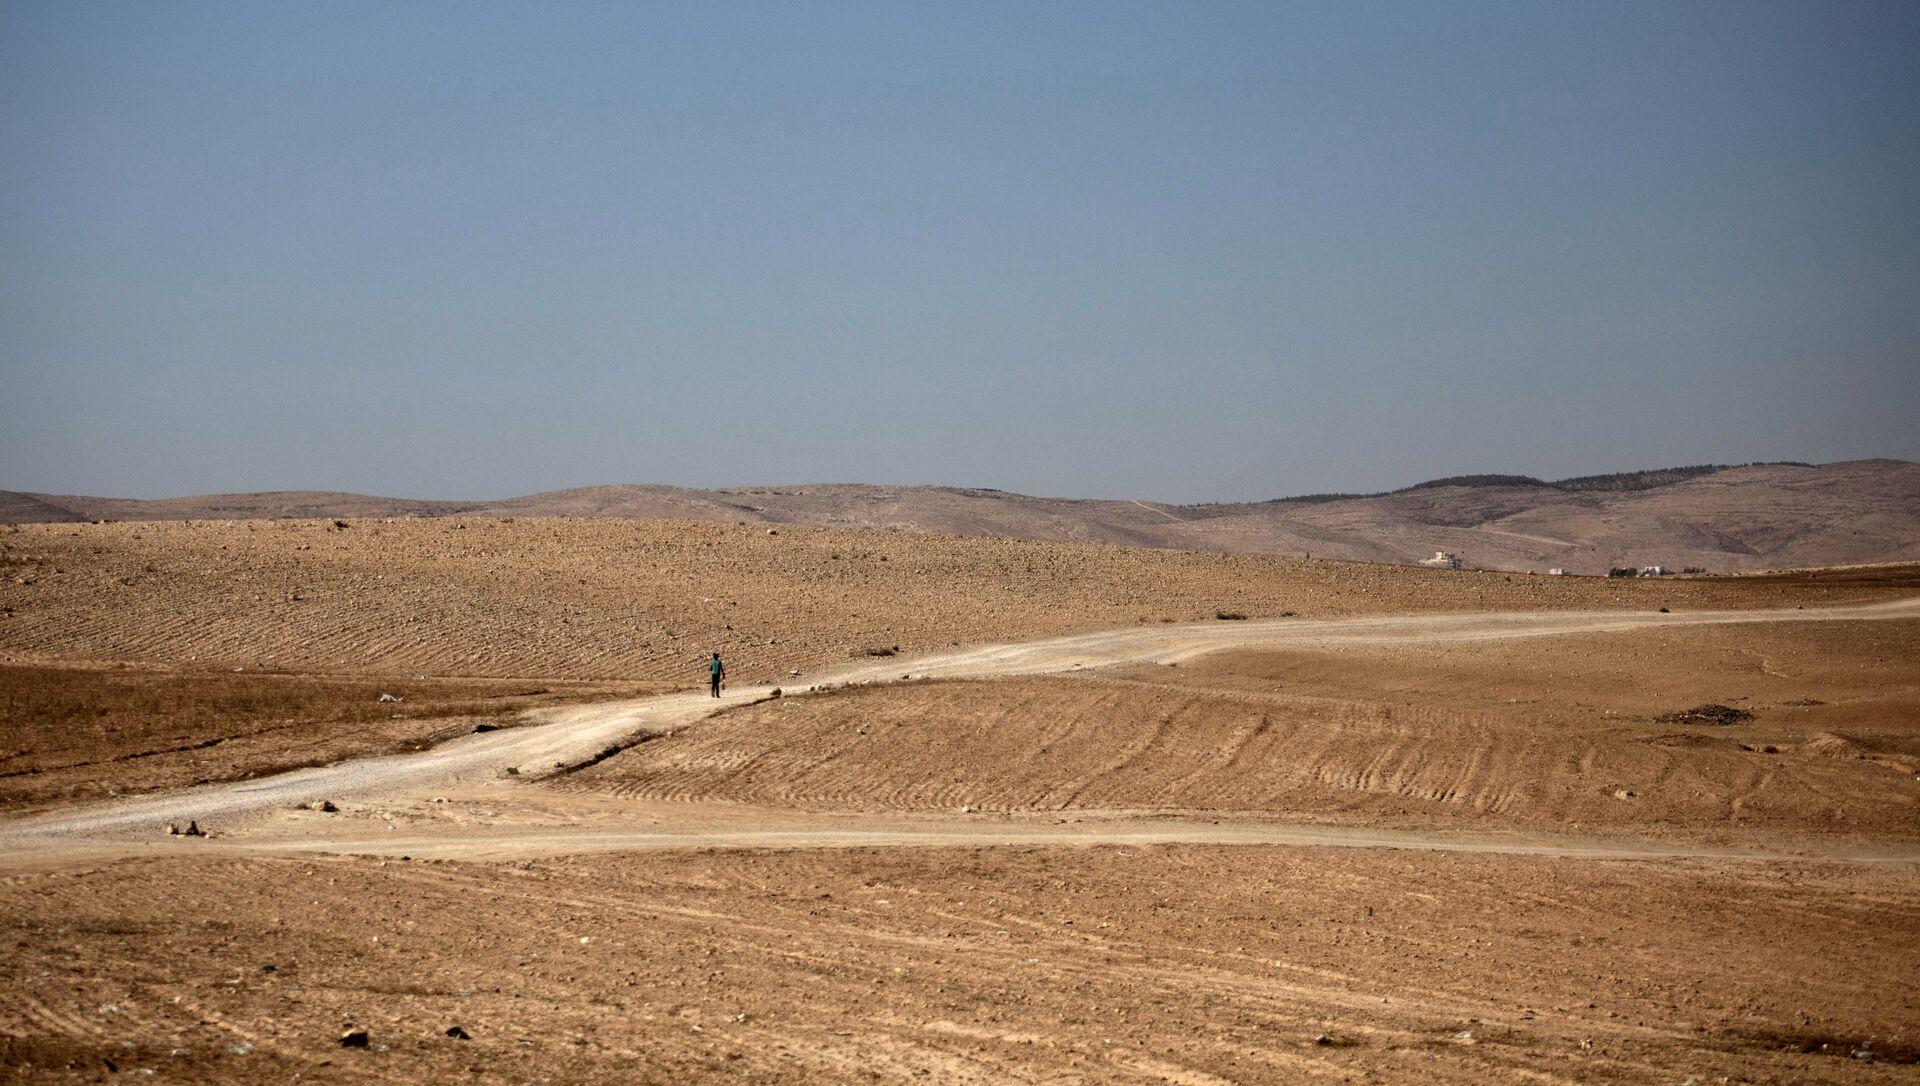 Israele deserto Negev - Sputnik Italia, 1920, 10.03.2021